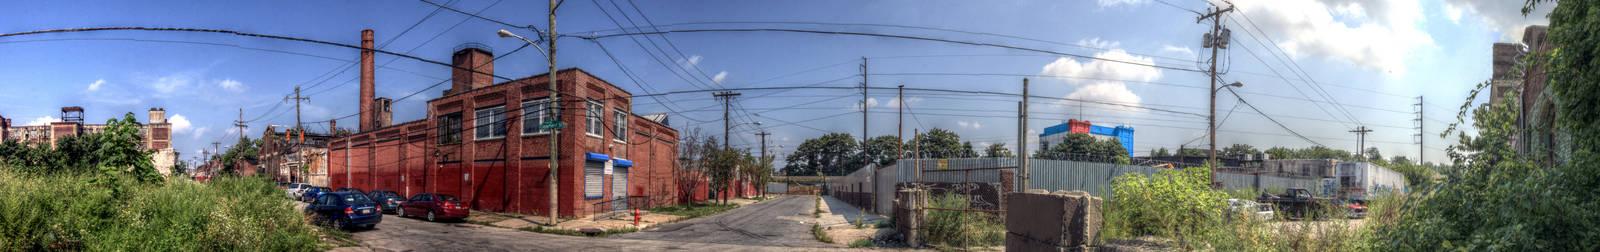 Panorama 3737 hdr pregamma 1 mantiuk06 contrast ma by bruhinb